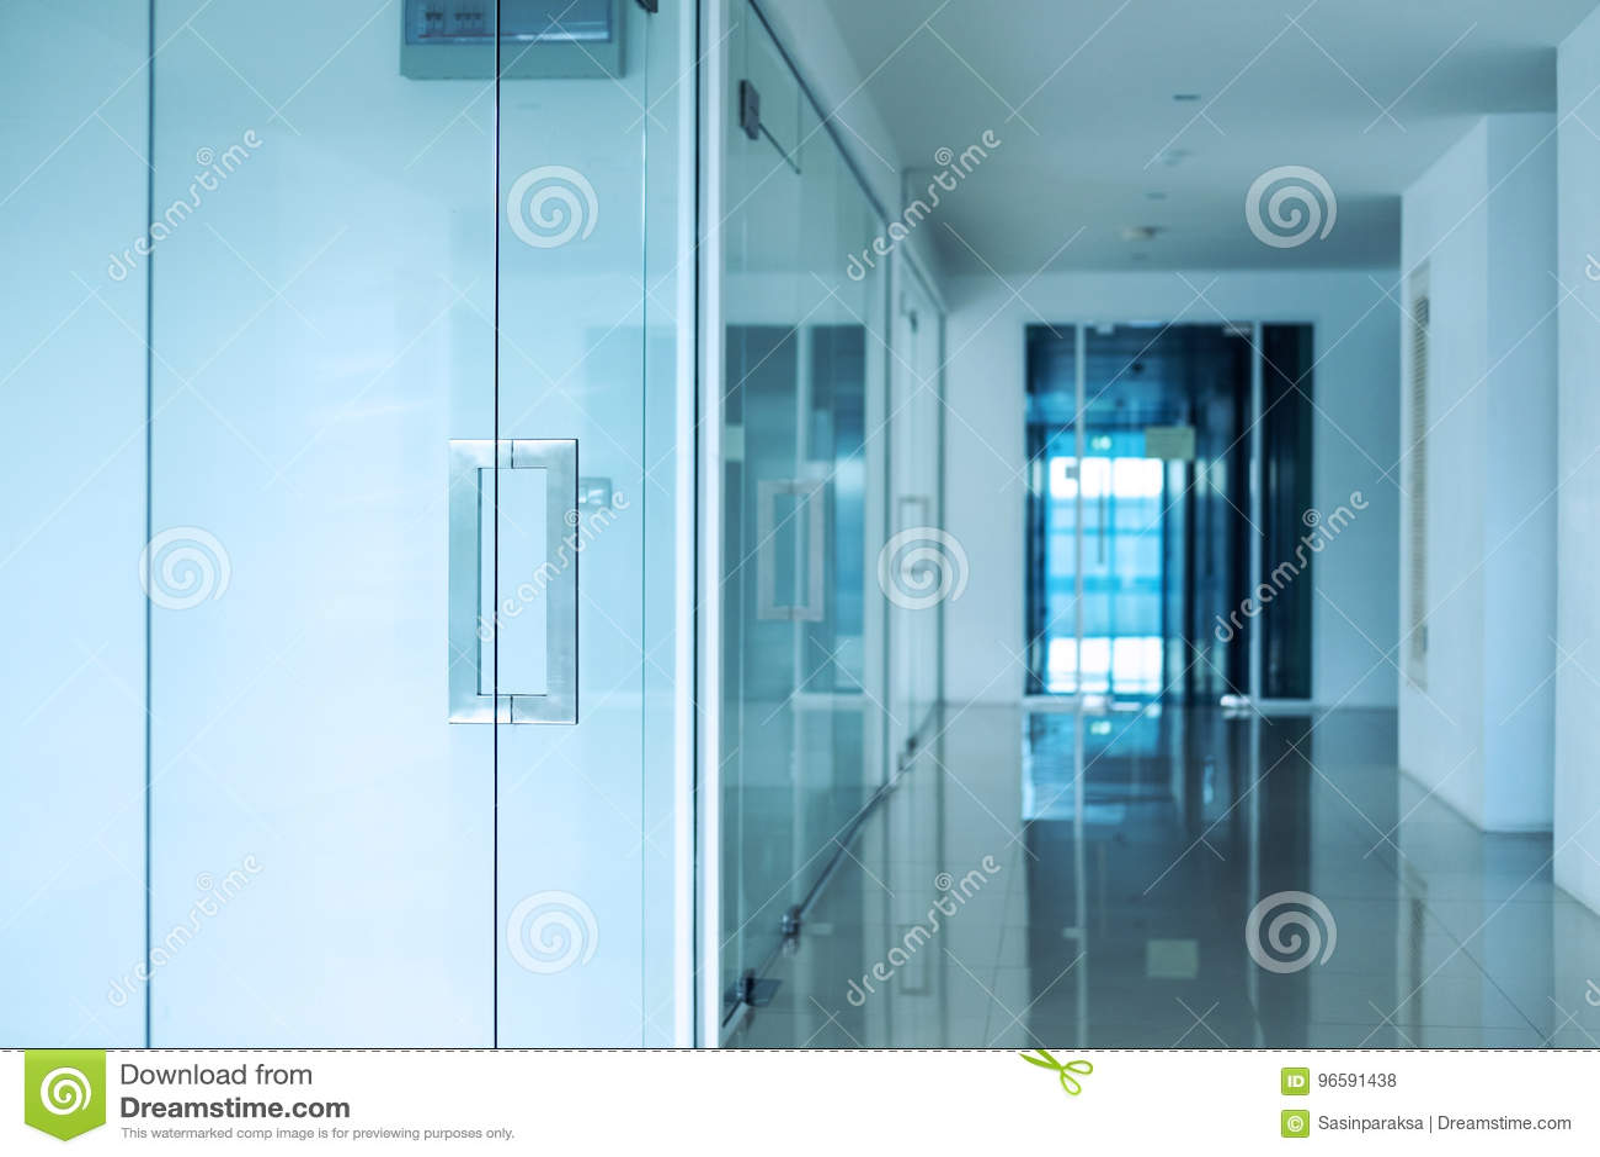 Moderner Büroinnenraum, Blau Tonte, Selektiver Fokus Auf Türknauf ...